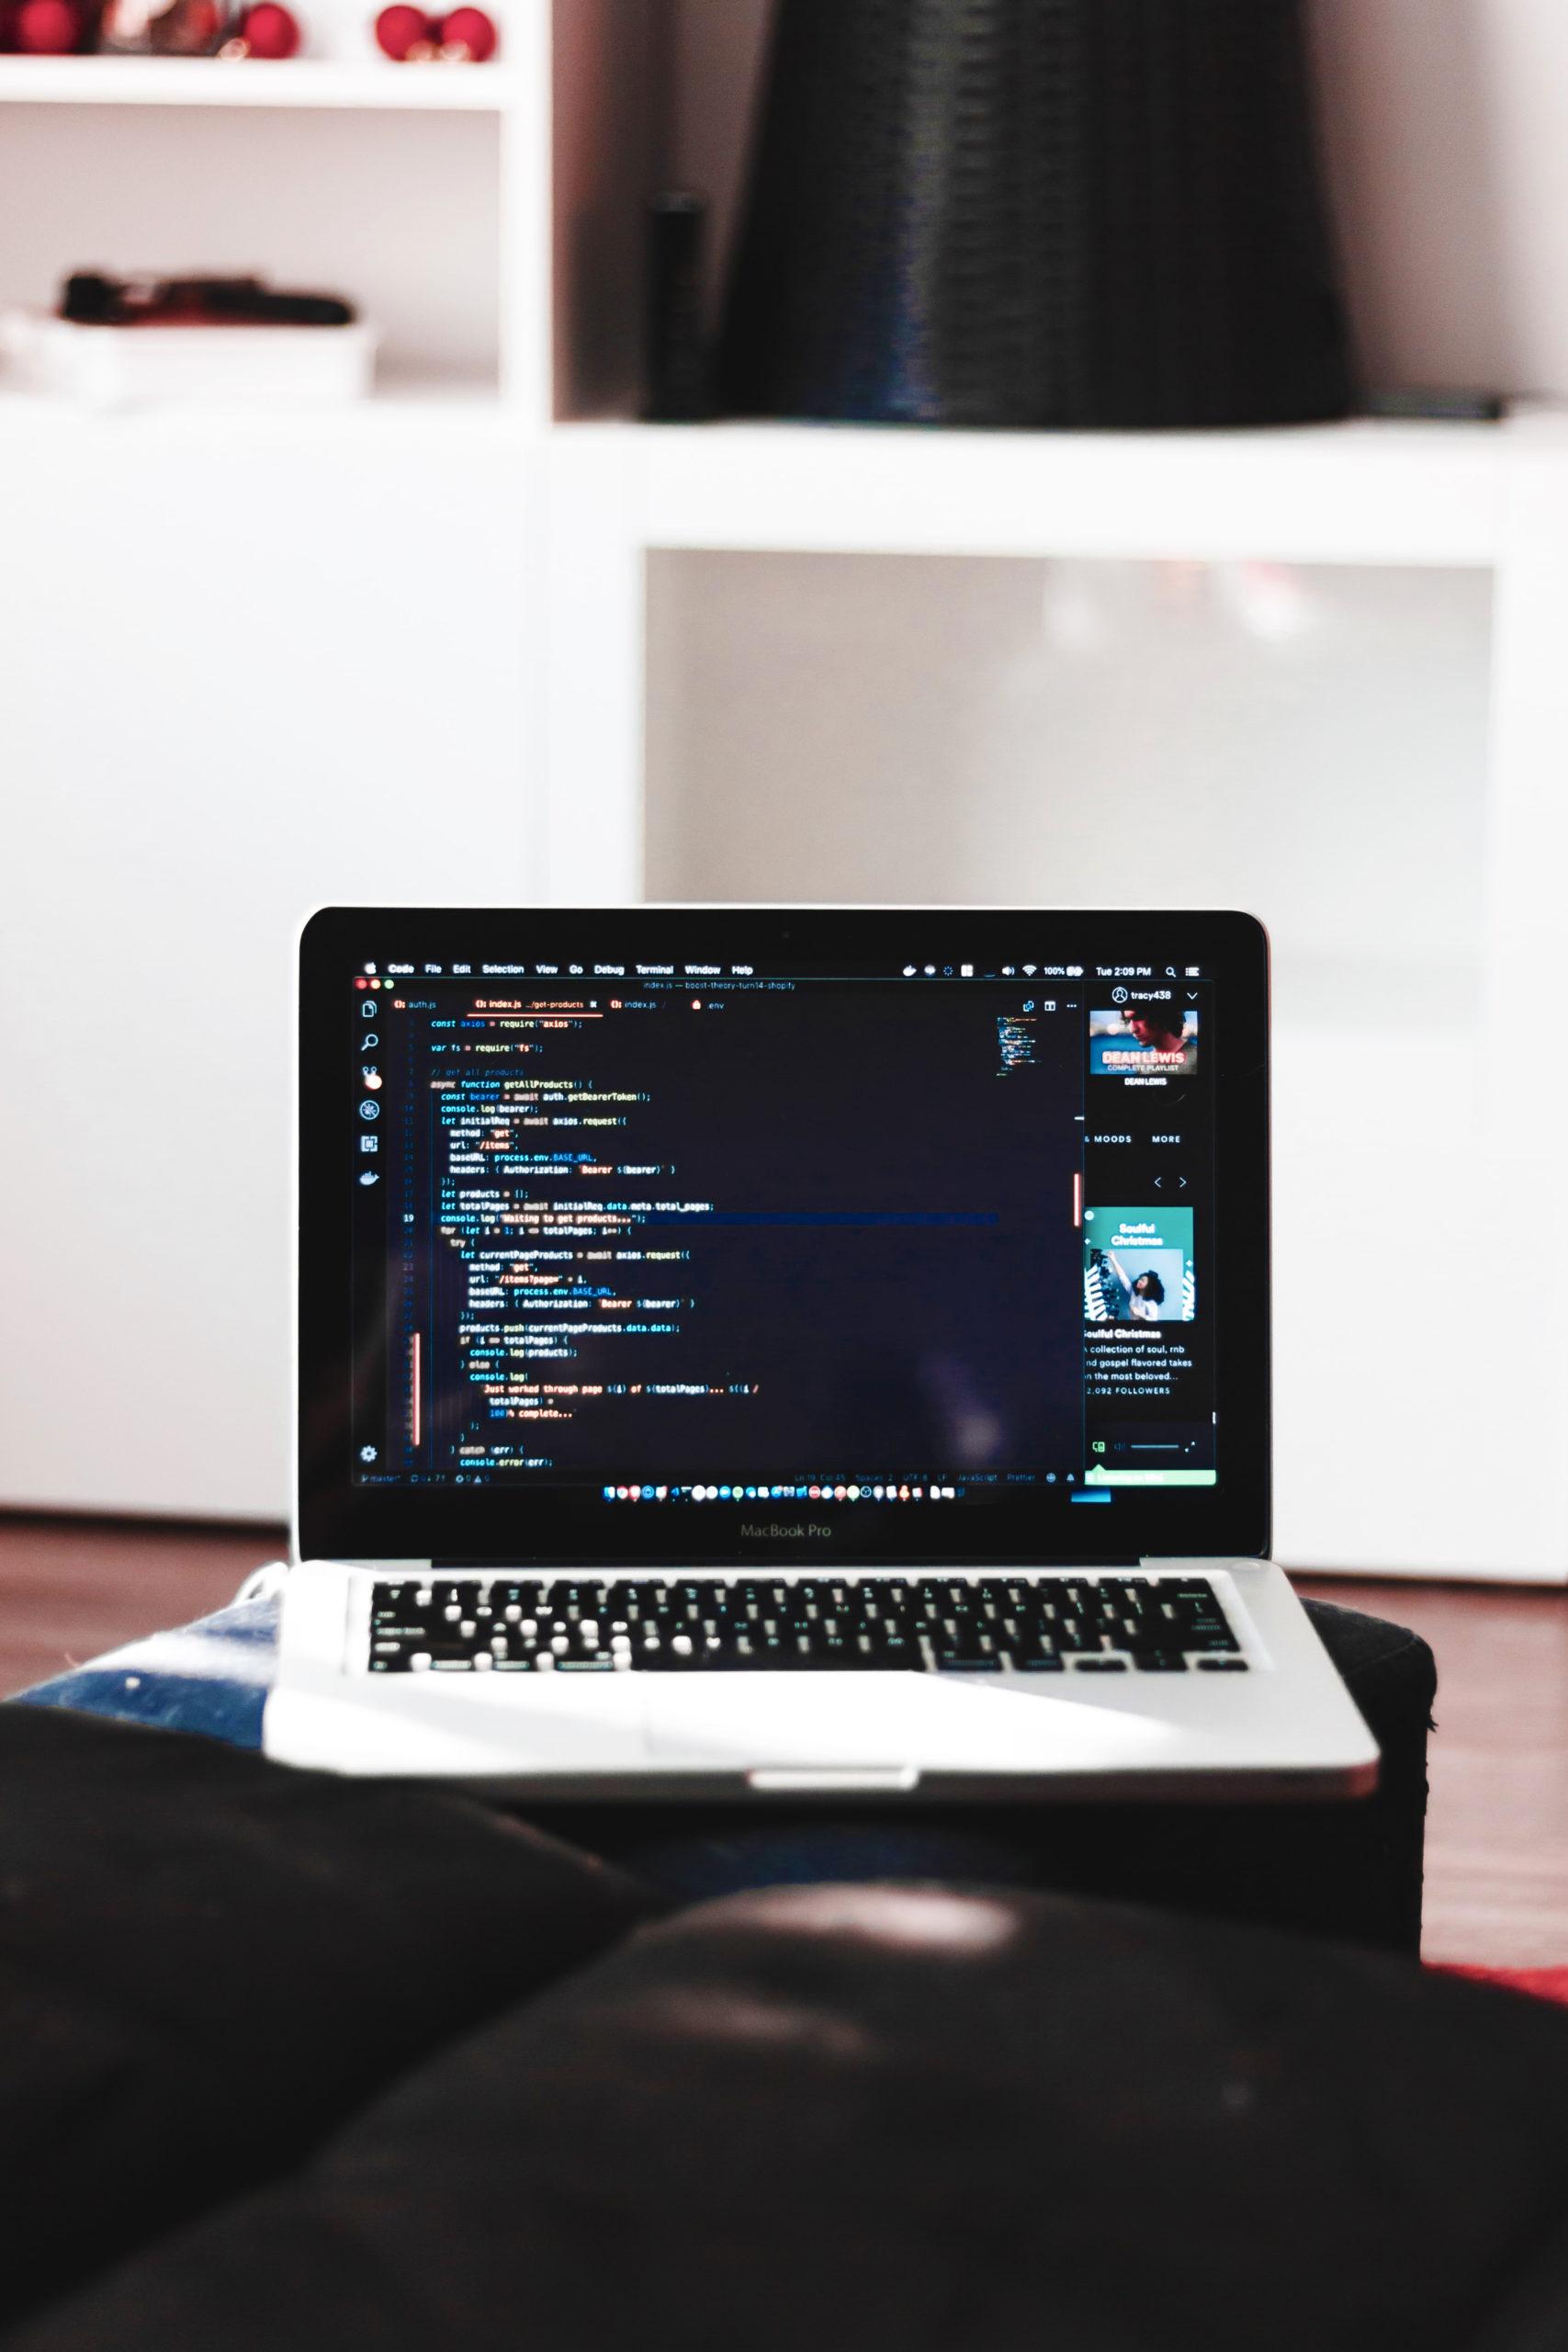 ordinateur sur un bureau